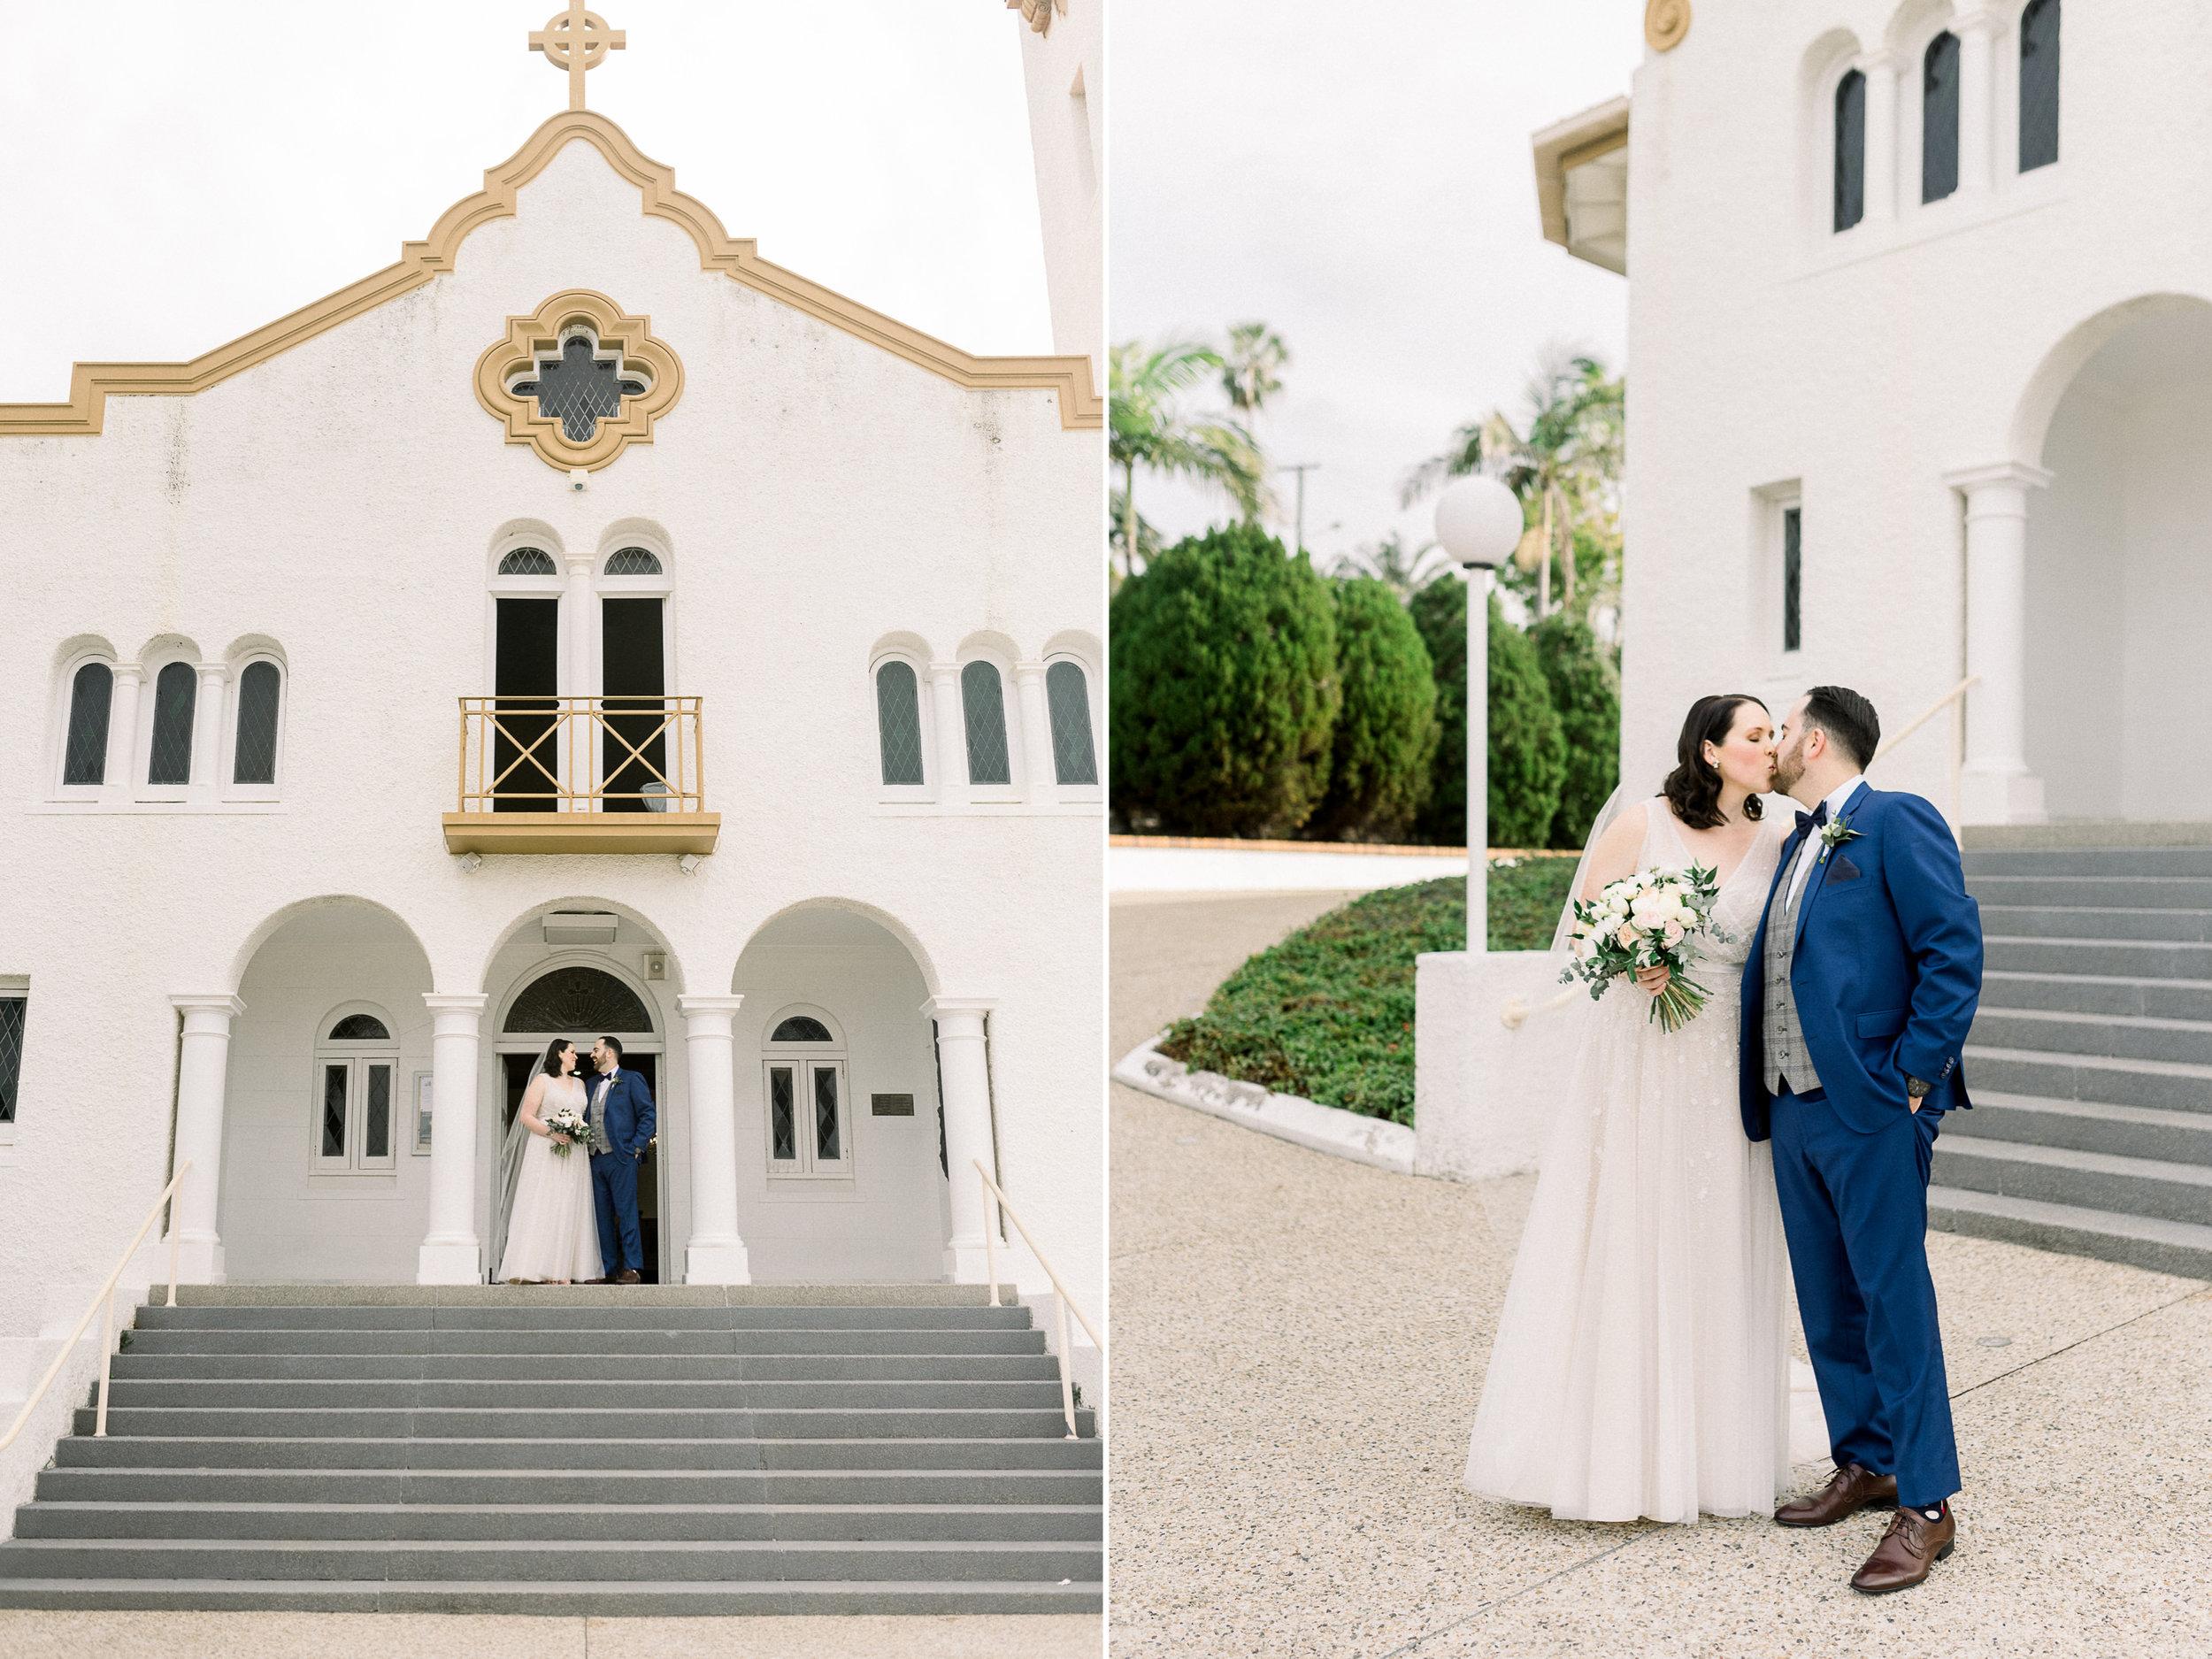 brisbane-city-wedding-church-ceremony-wedding-9.jpg